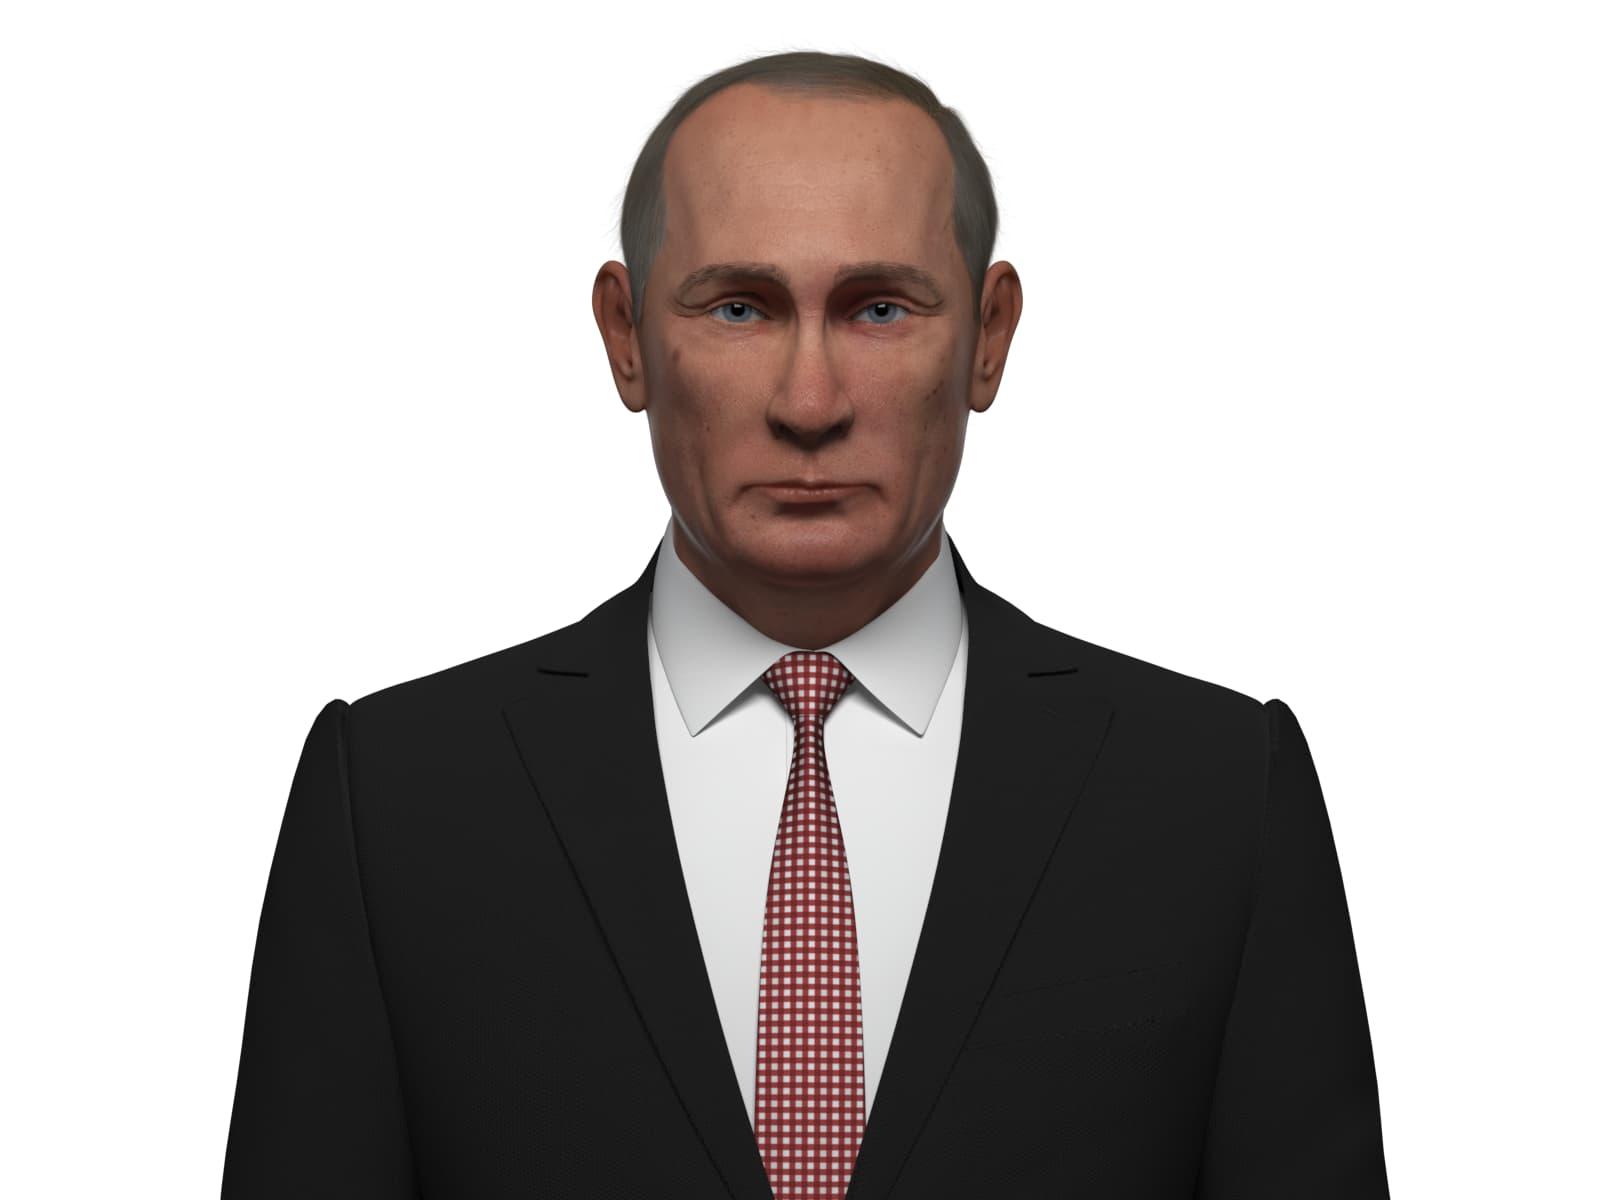 russian vladimir putin 3D model